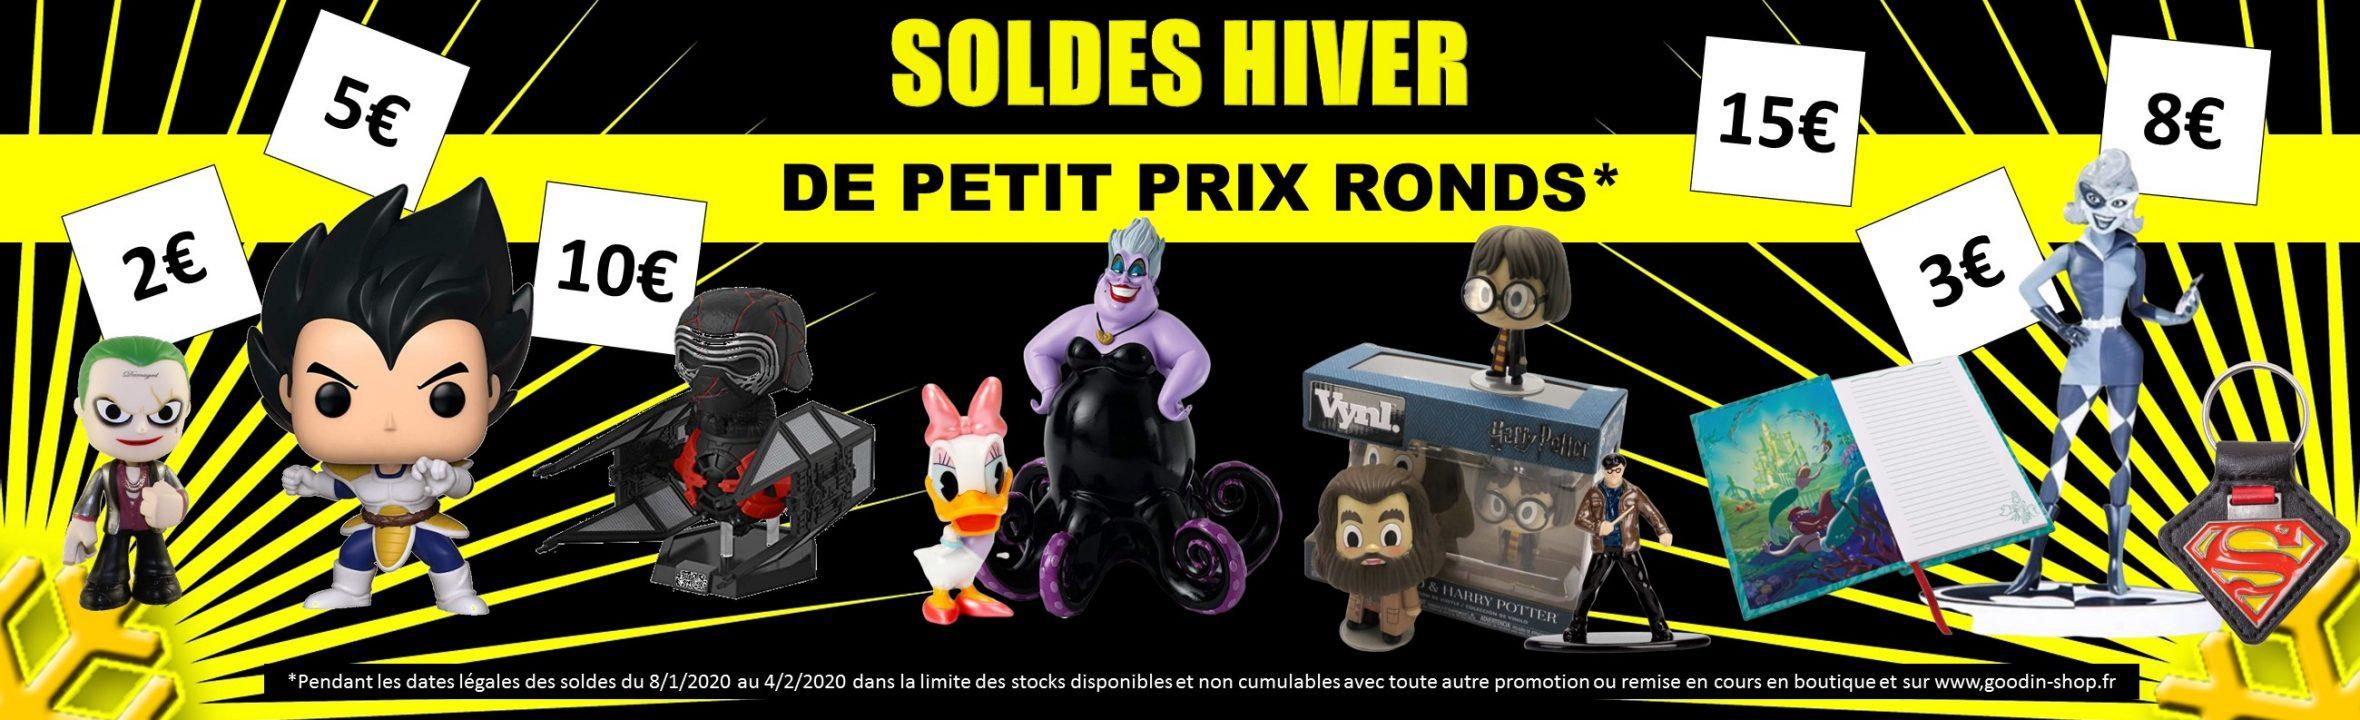 Soldes hiver 2020 Funko pop goodies et figurines